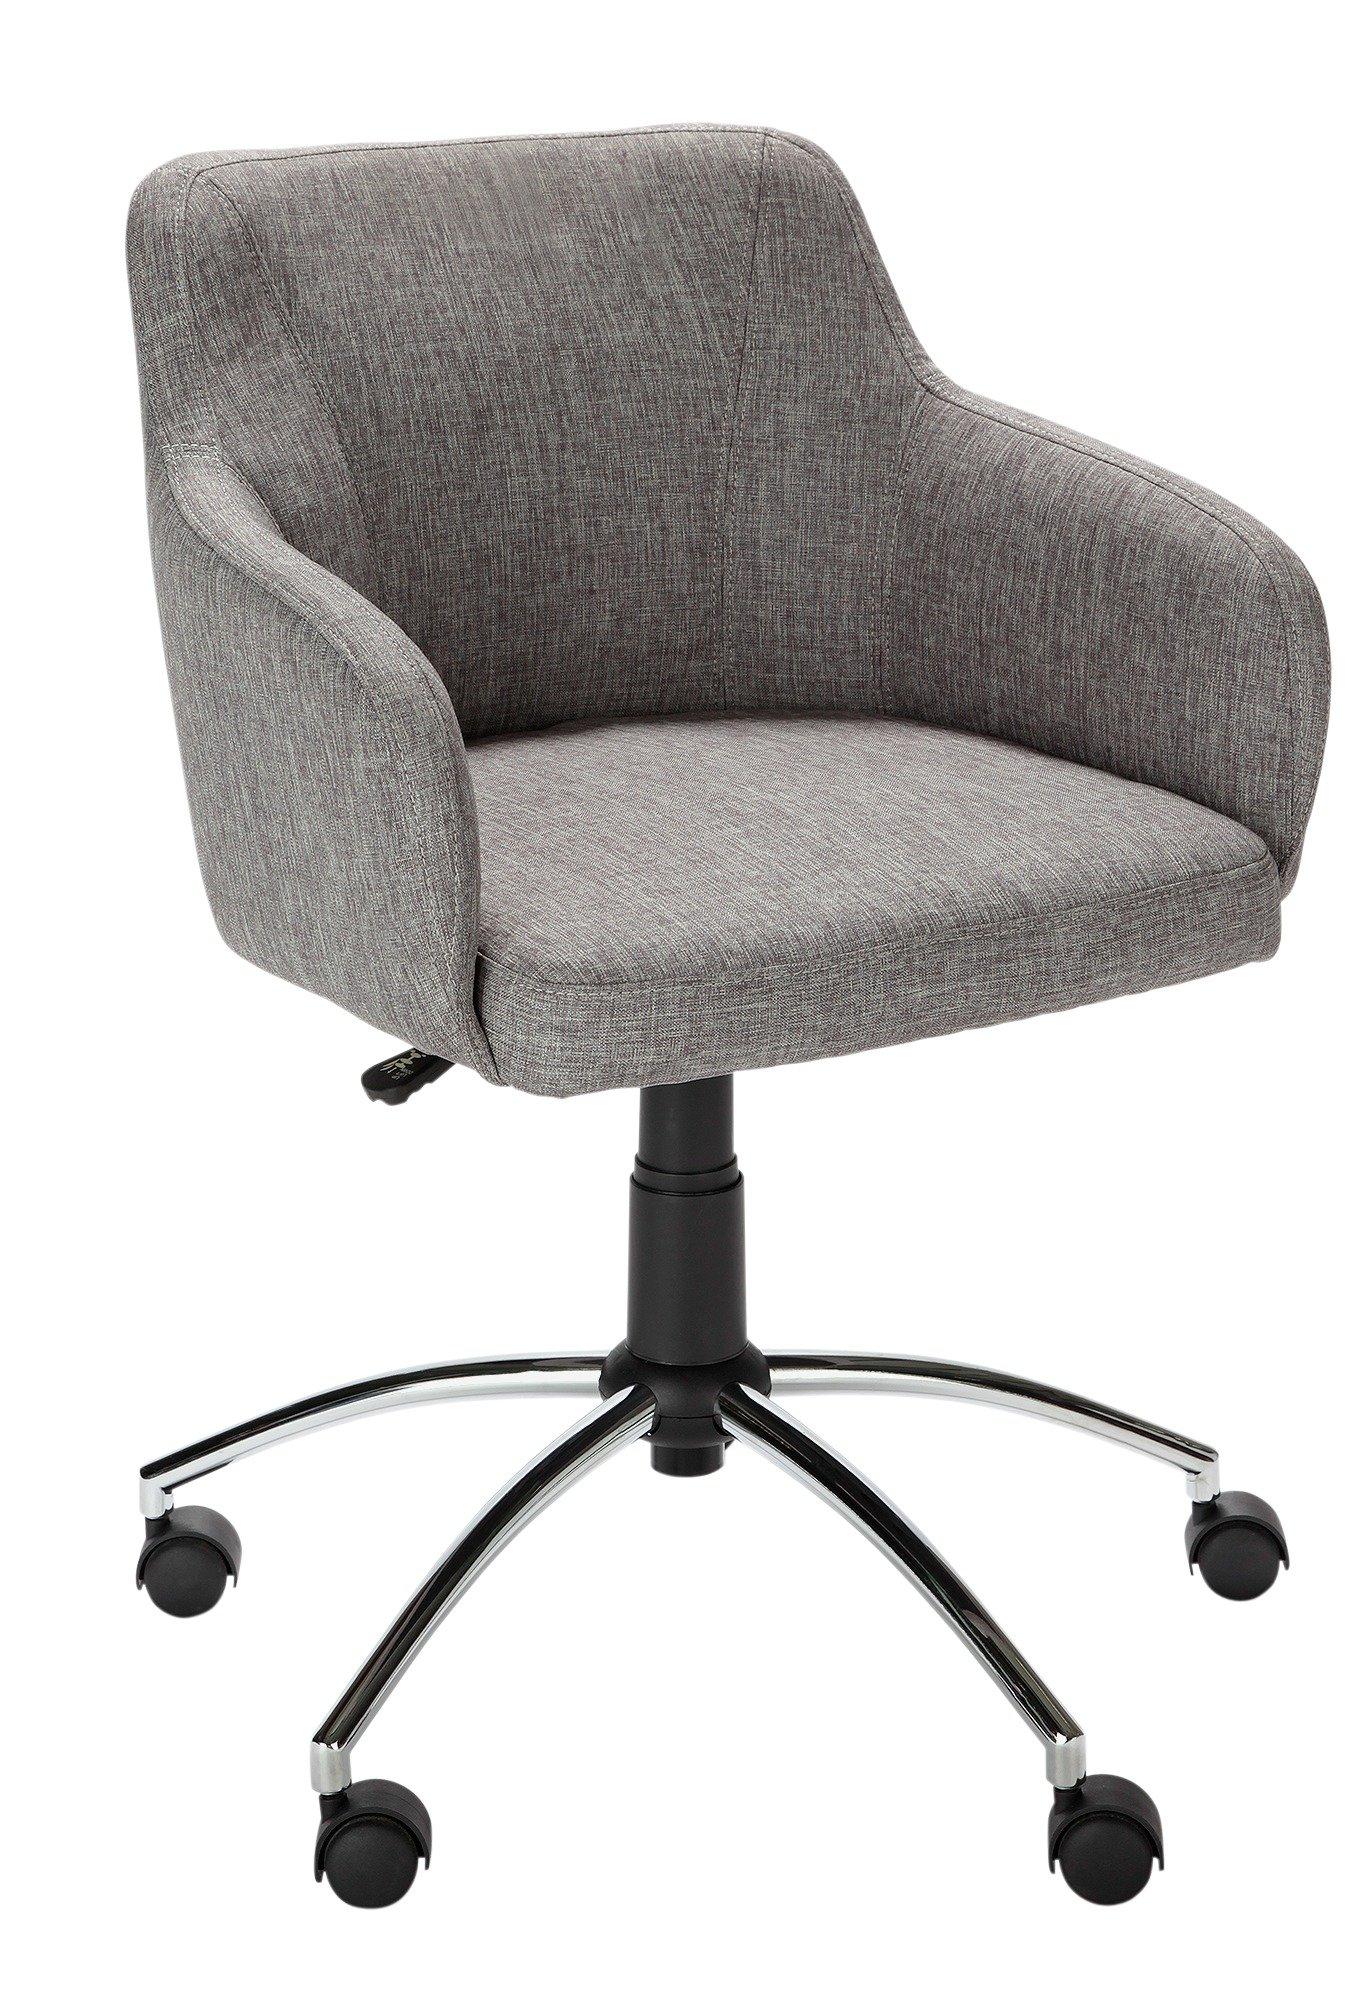 buy hygena sasha height adjustable office chair - grey at argos.co